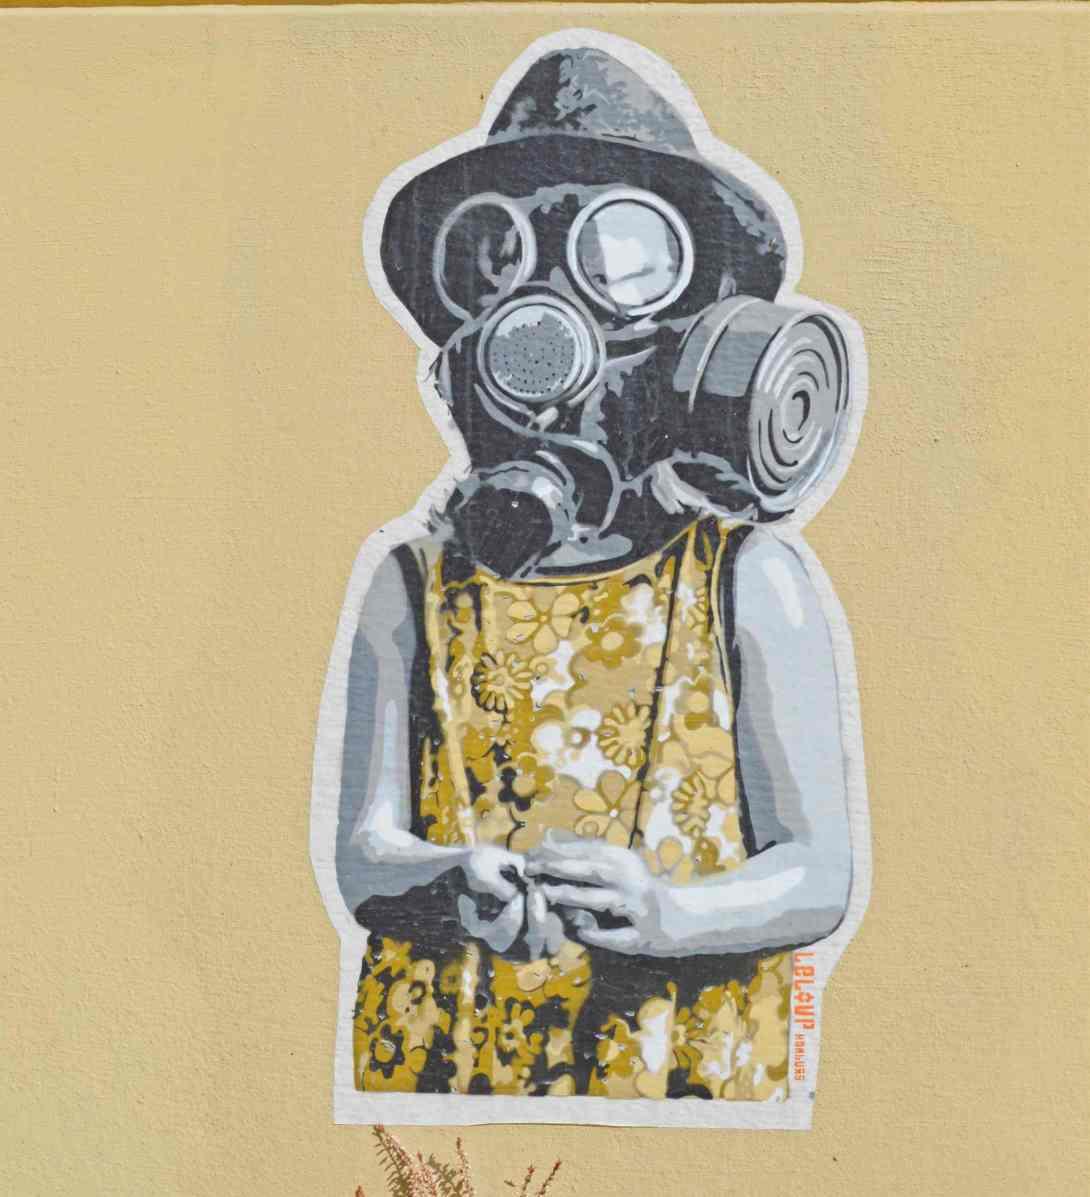 #leloup #streetart #berlin Prenzlauer Berg be kitschig blog